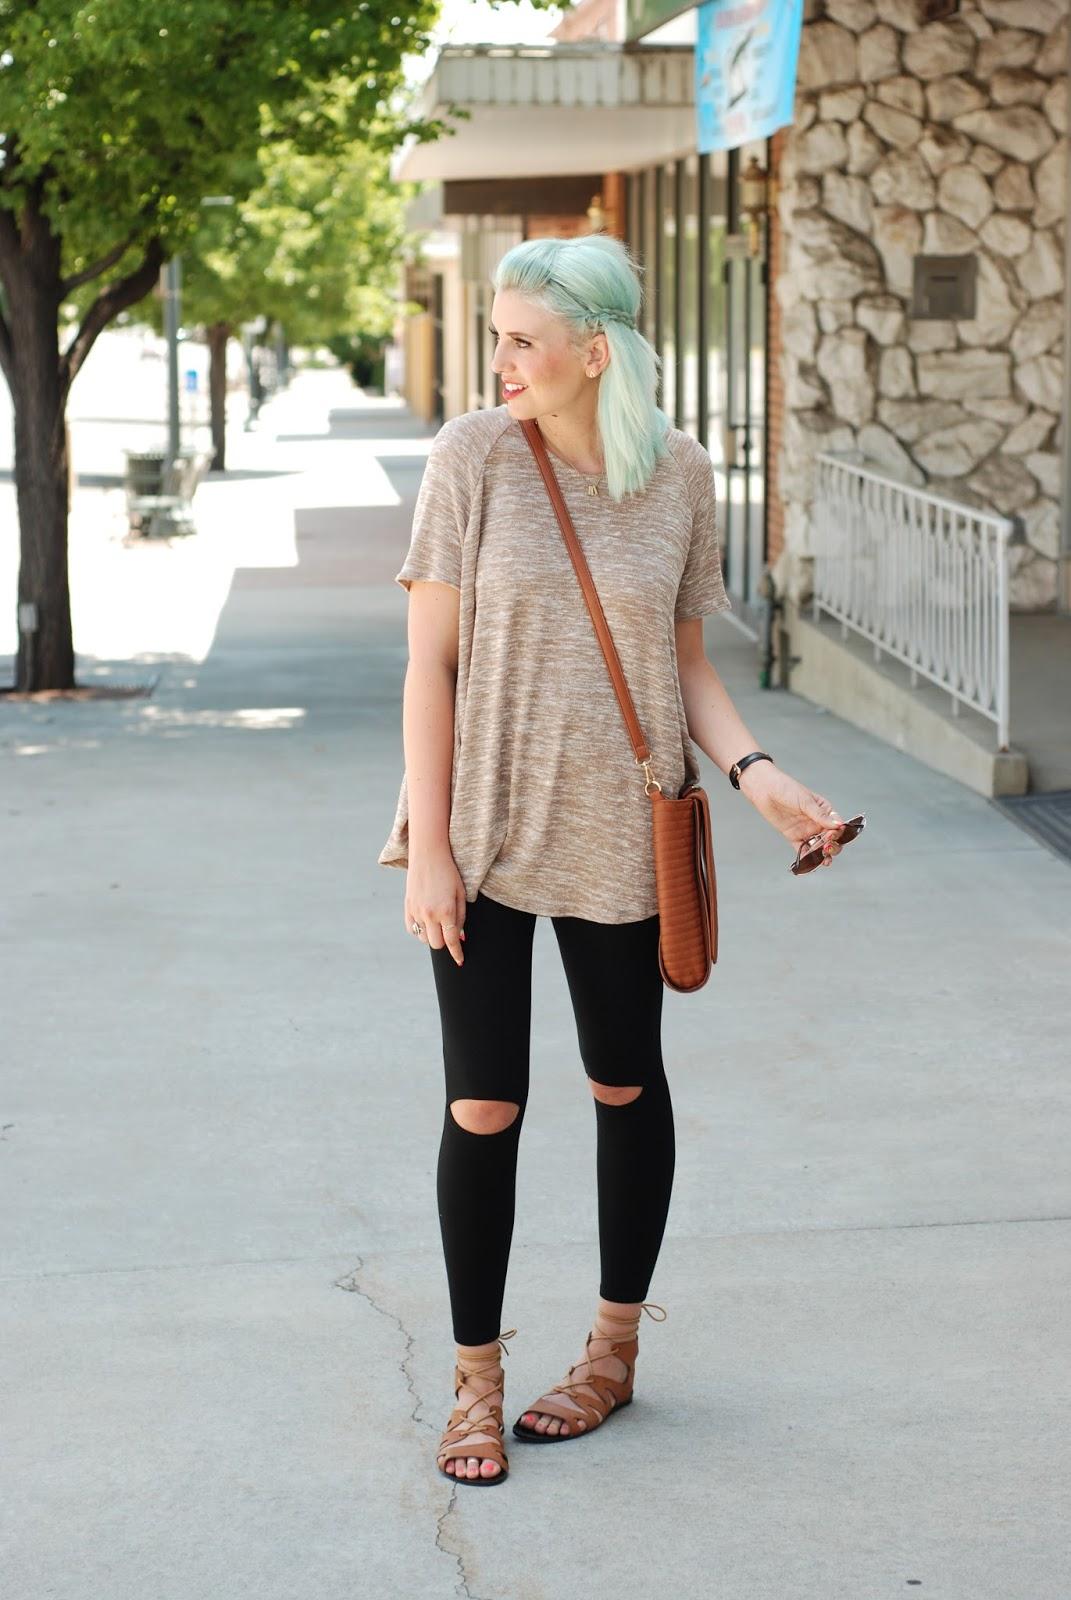 Sidney Clark Designs, Modest Fashion blogger, Caralase